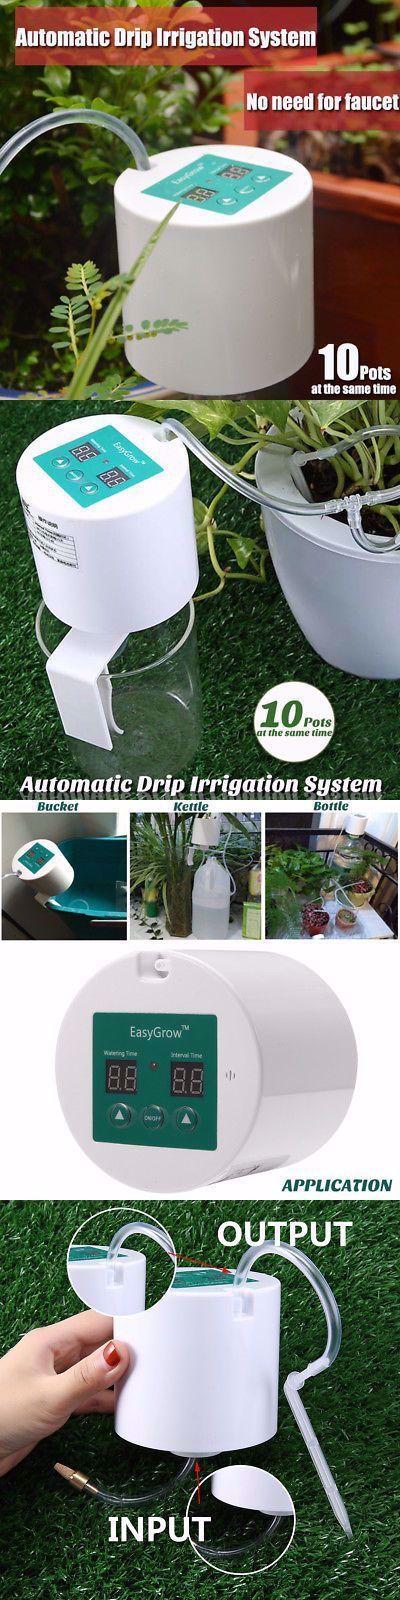 Irrigation System Diy Sprinkler In 2020 Drip Irrigation 400 x 300